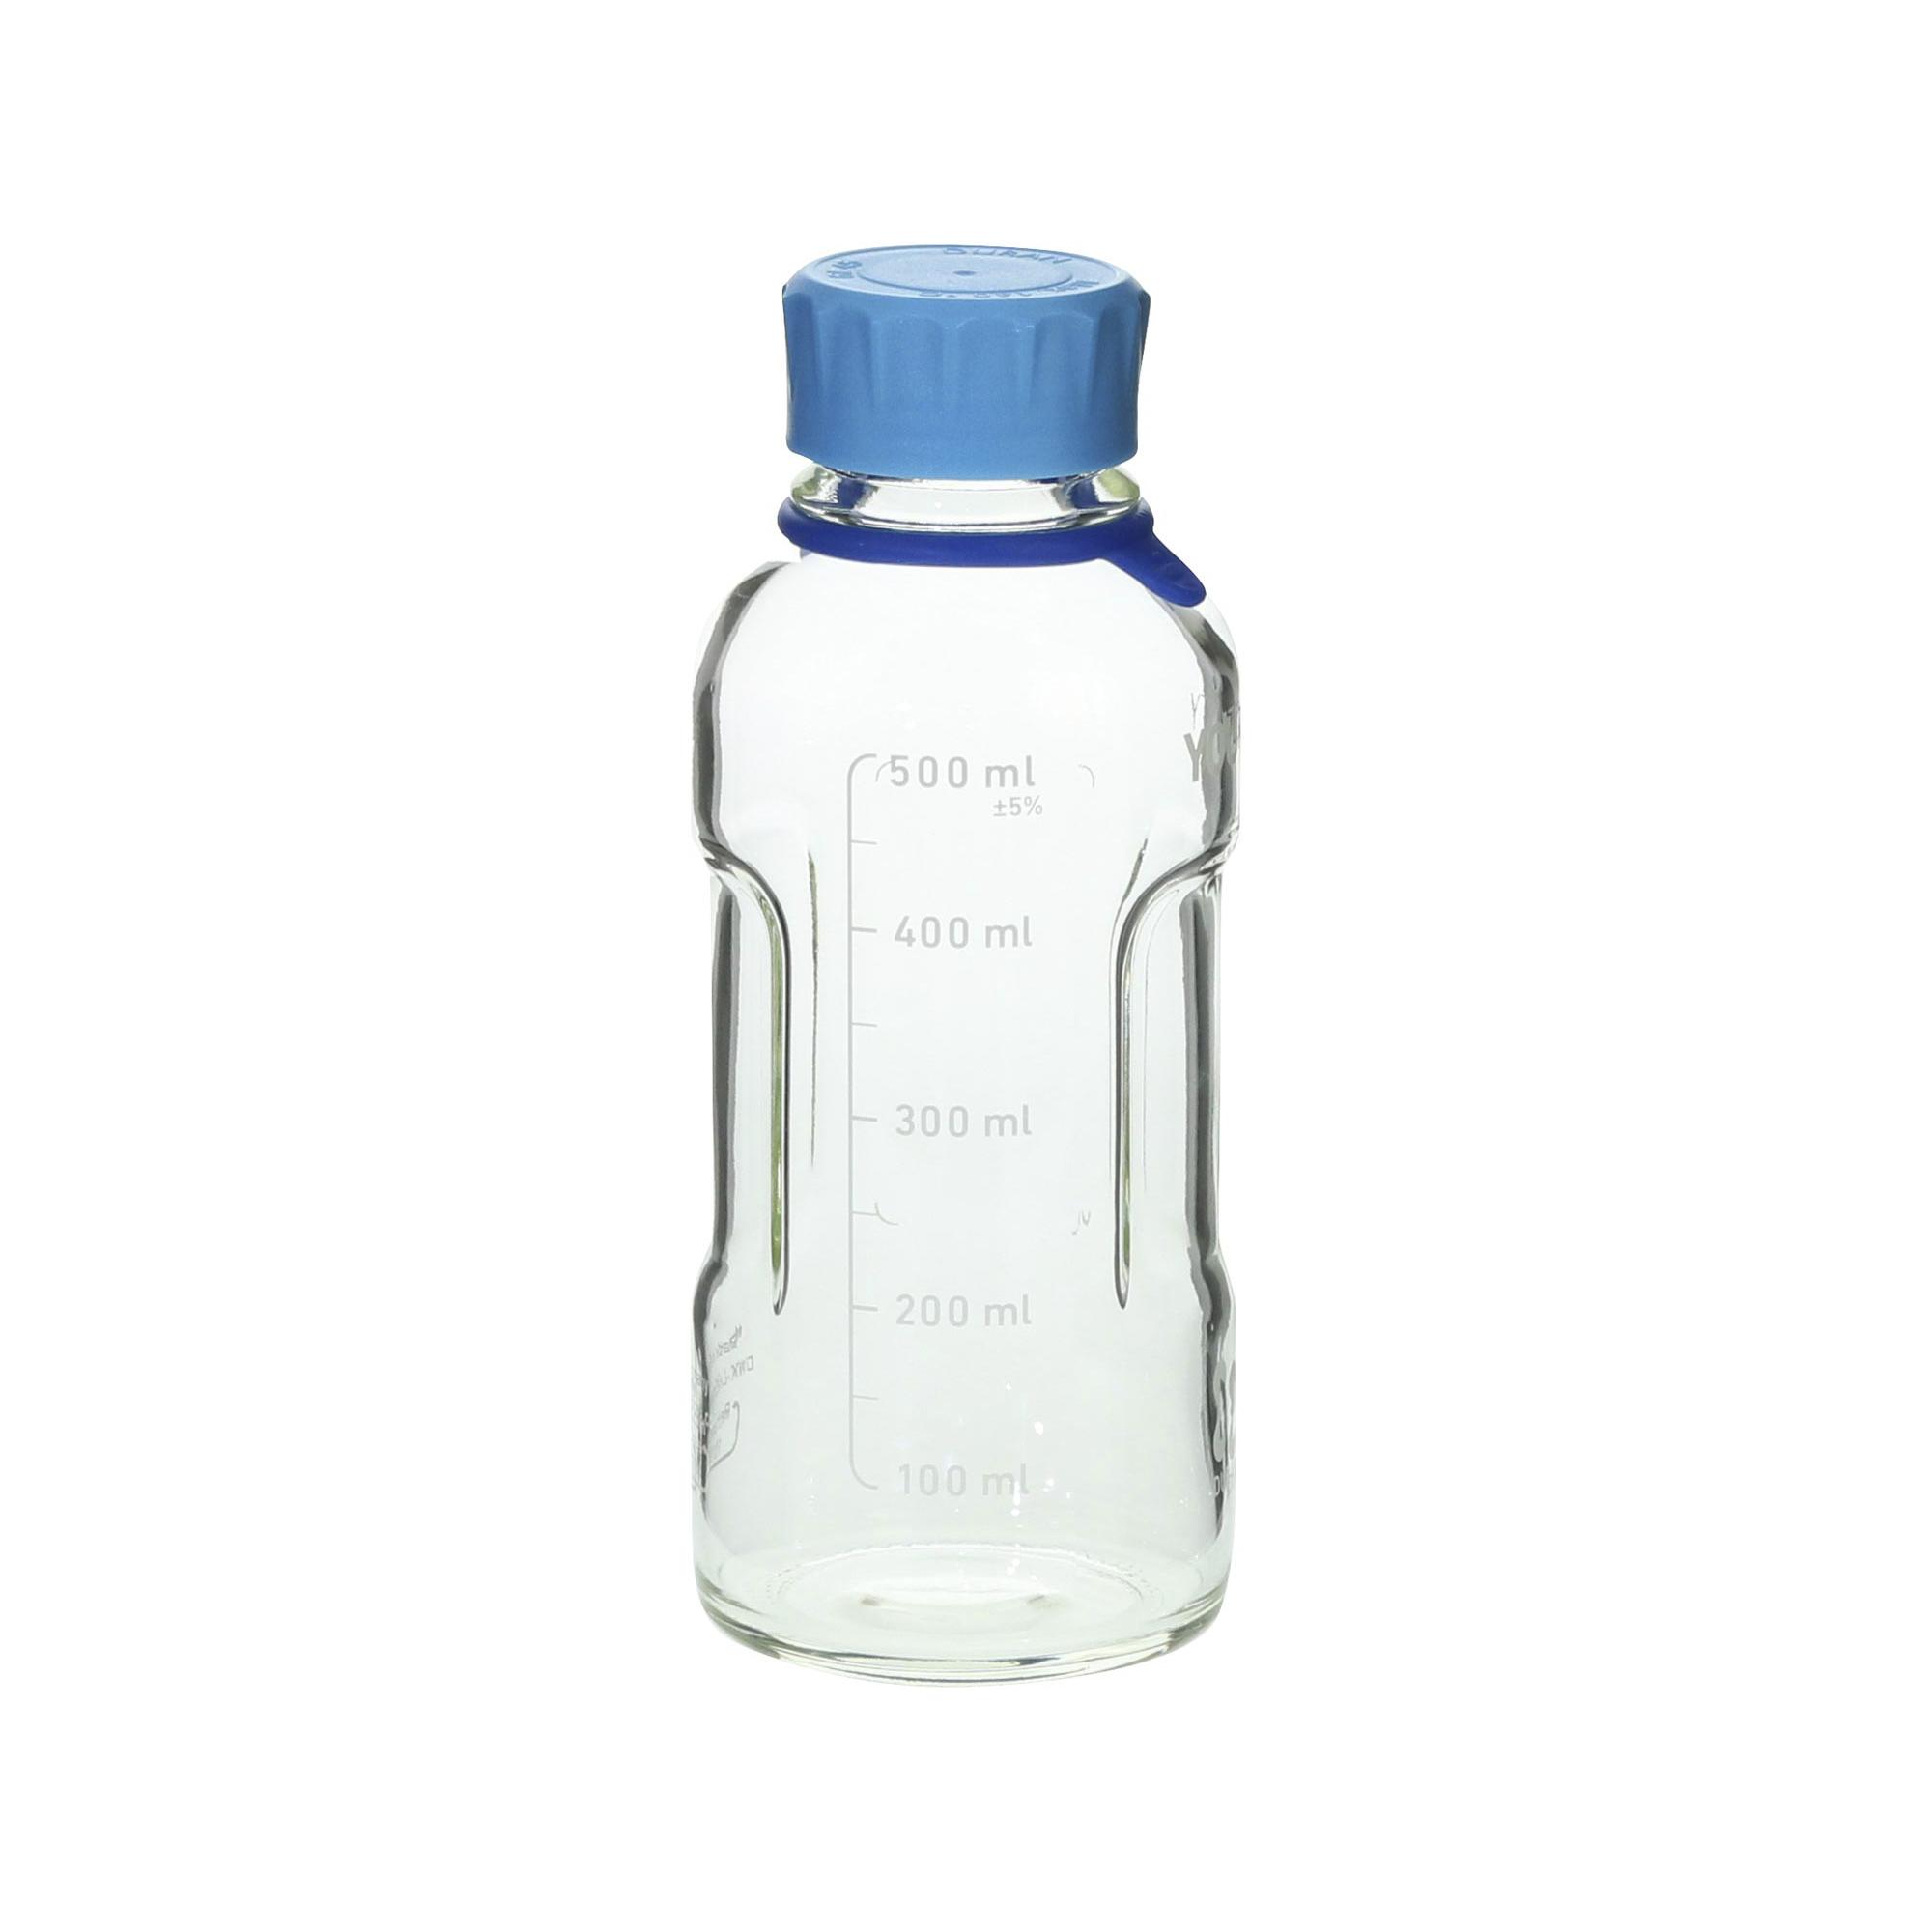 017310-500A DURAN ユーティリティーねじ口ボトル 水キャップ付 500mL(4個) 柴田科学(SIBATA)